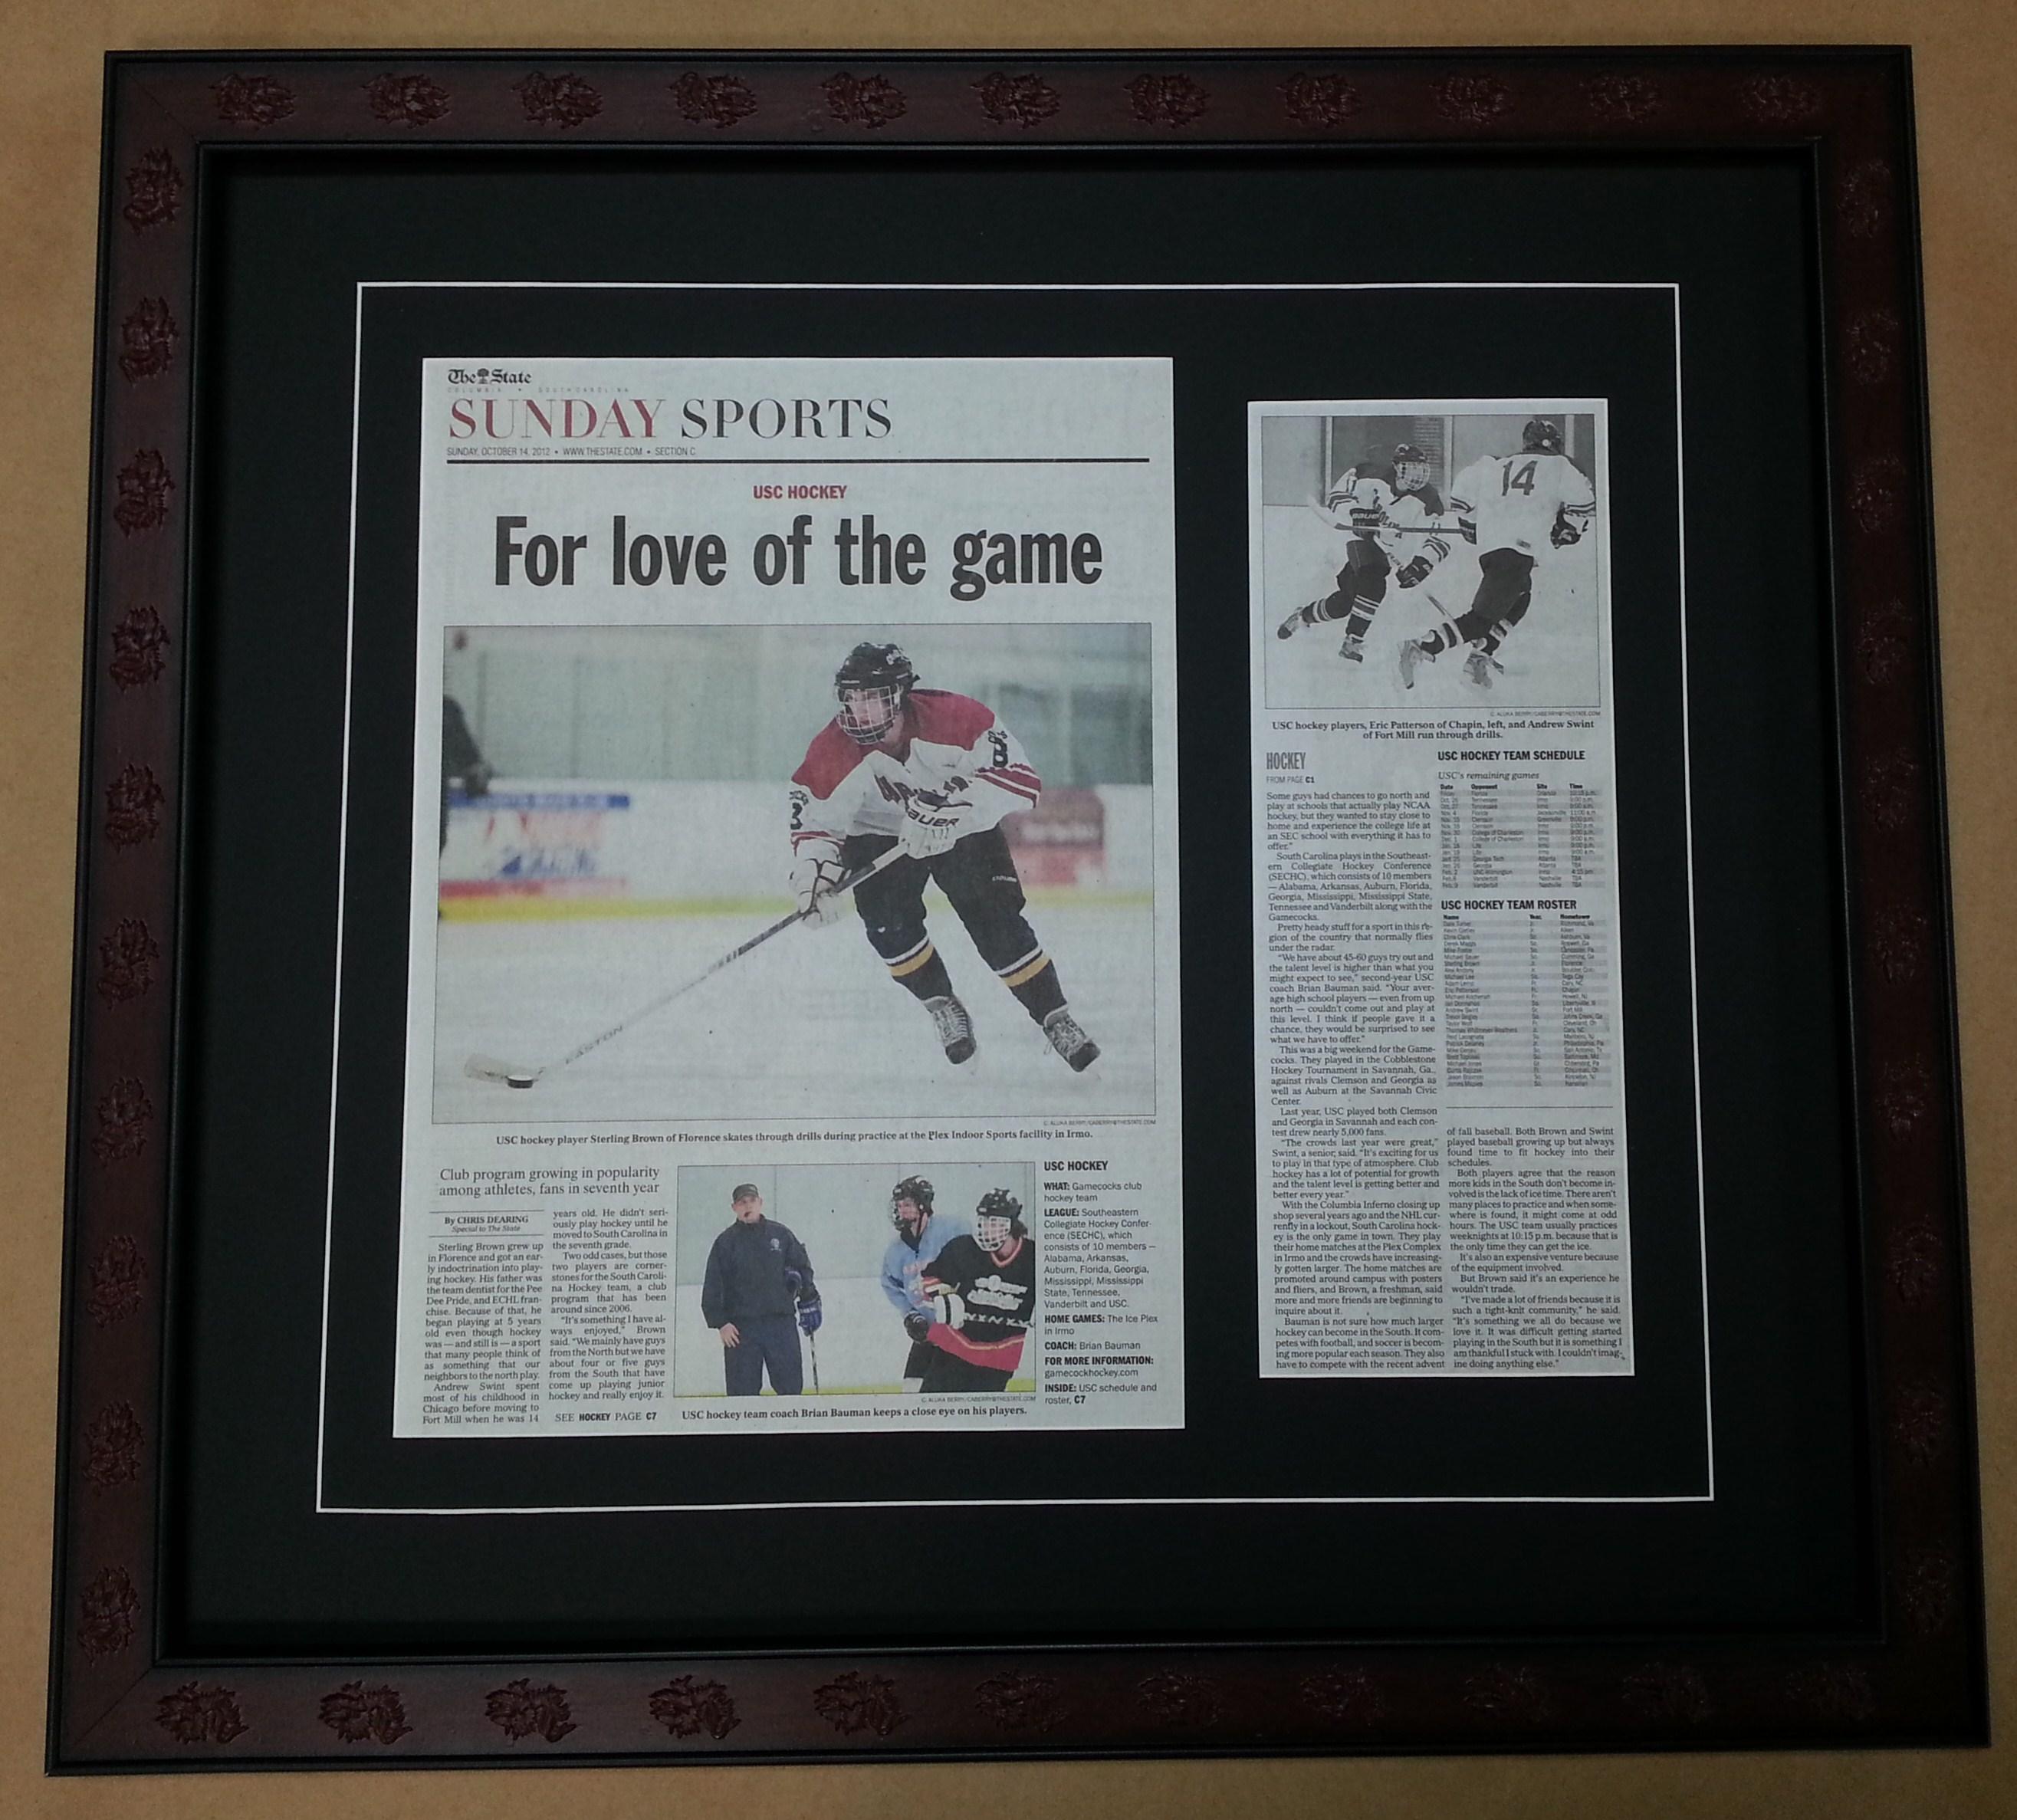 Framed Newspaper Article Columbia Frame Shop